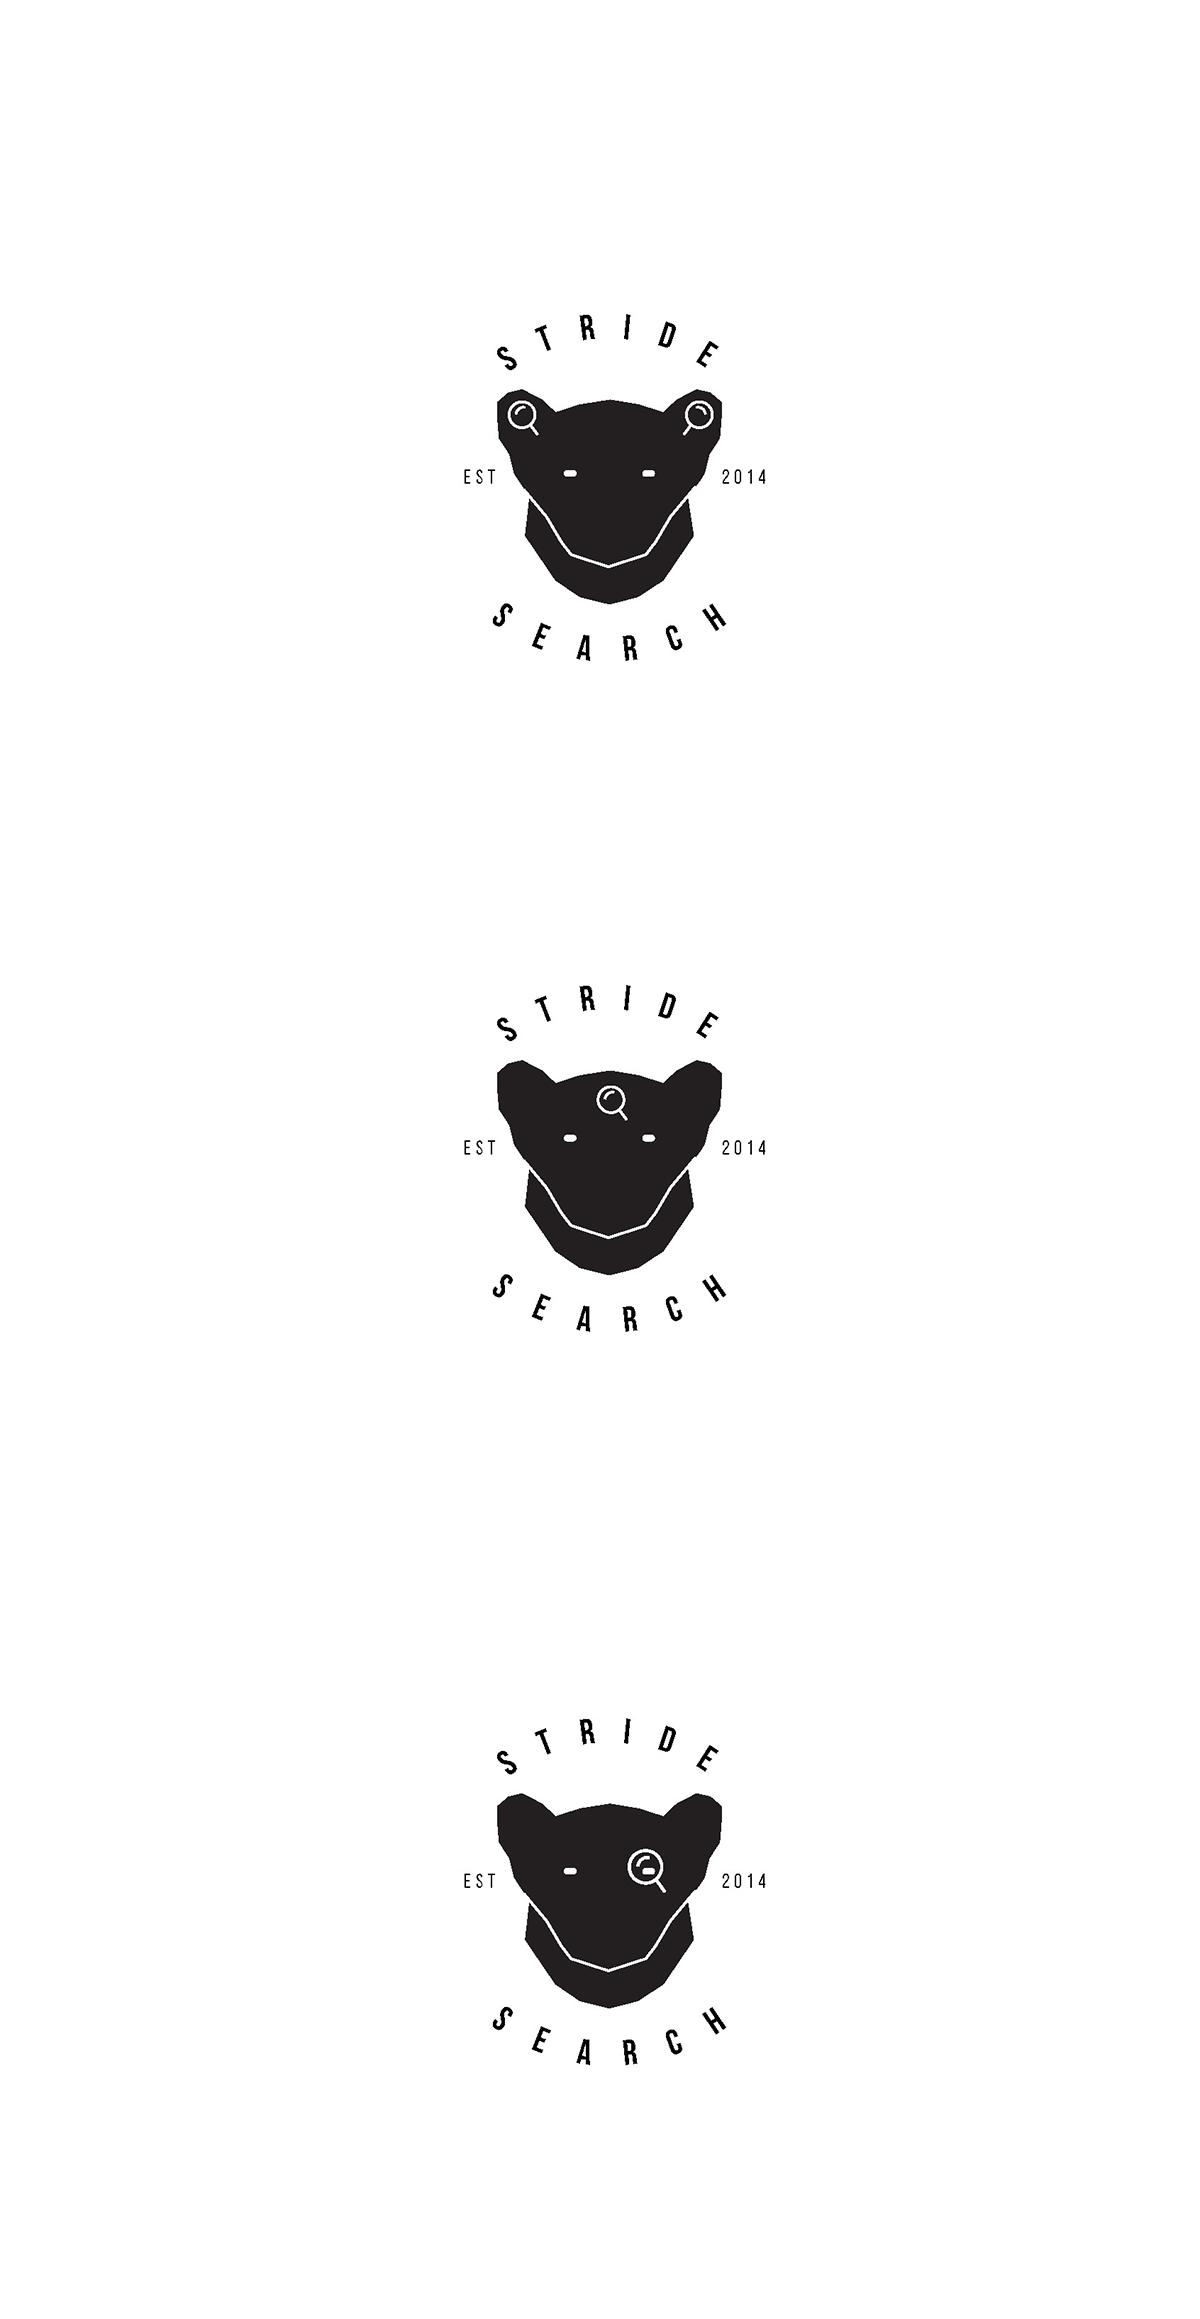 stride search concept 4 cheetah logo 4